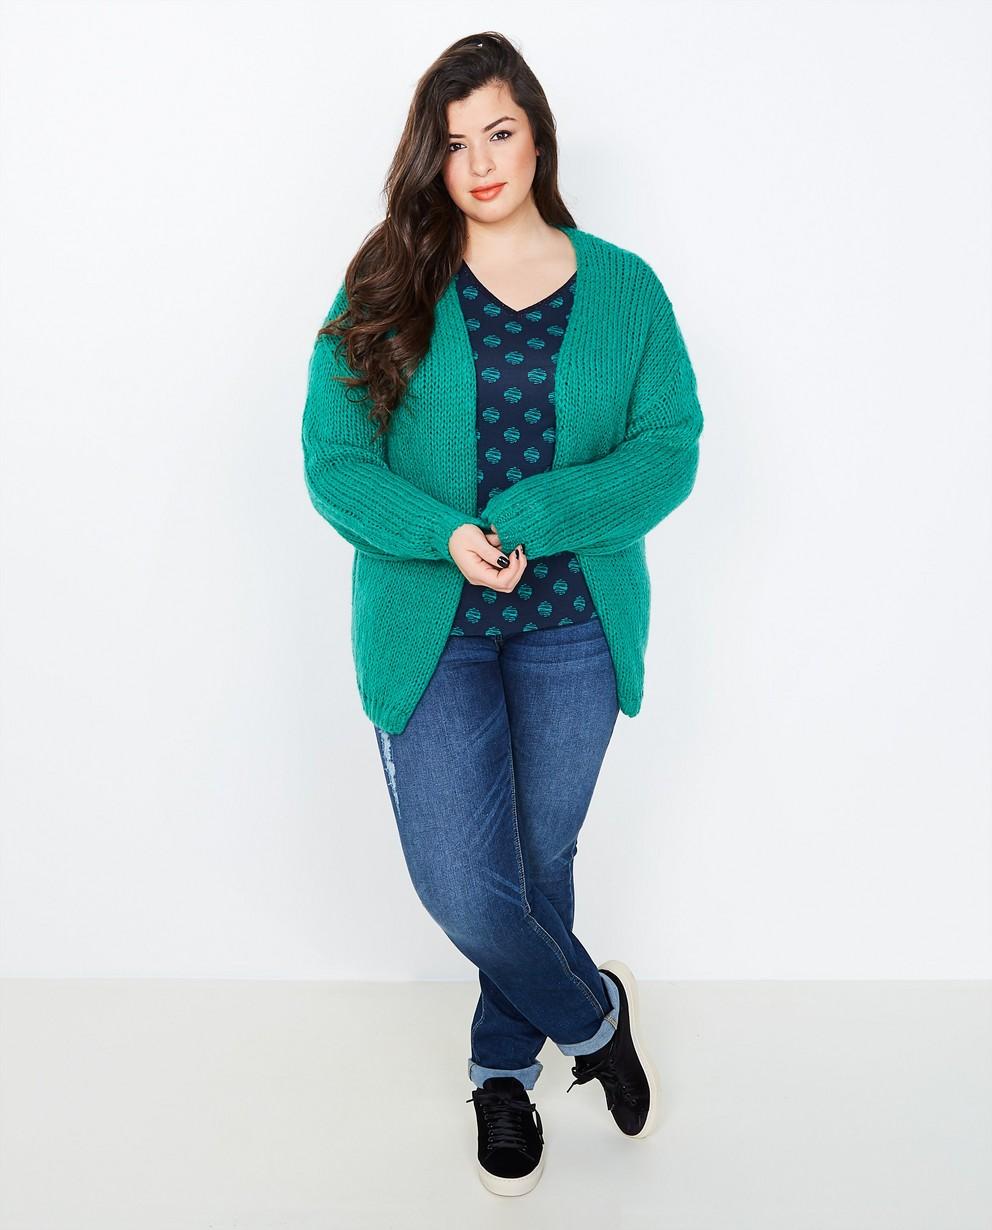 émeraude en Lena laine Gilet Lena luxueuse mélangée vert 1RPxCwqA